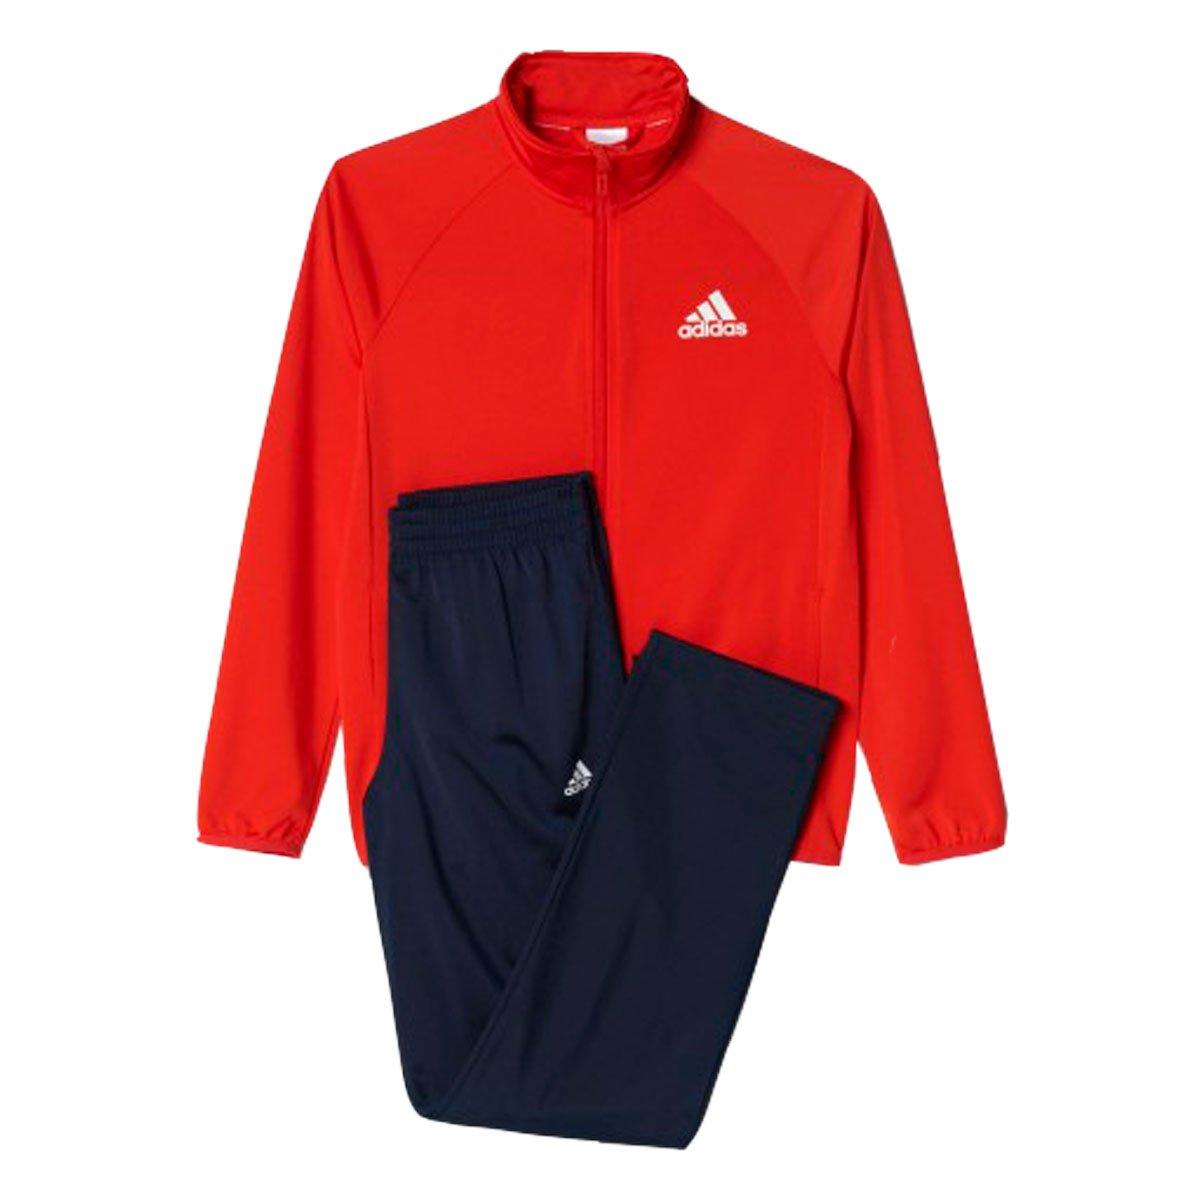 54086fad251 Bizz Store - Agasalho Infantil Menino Adidas YB TS Entry Open Hem